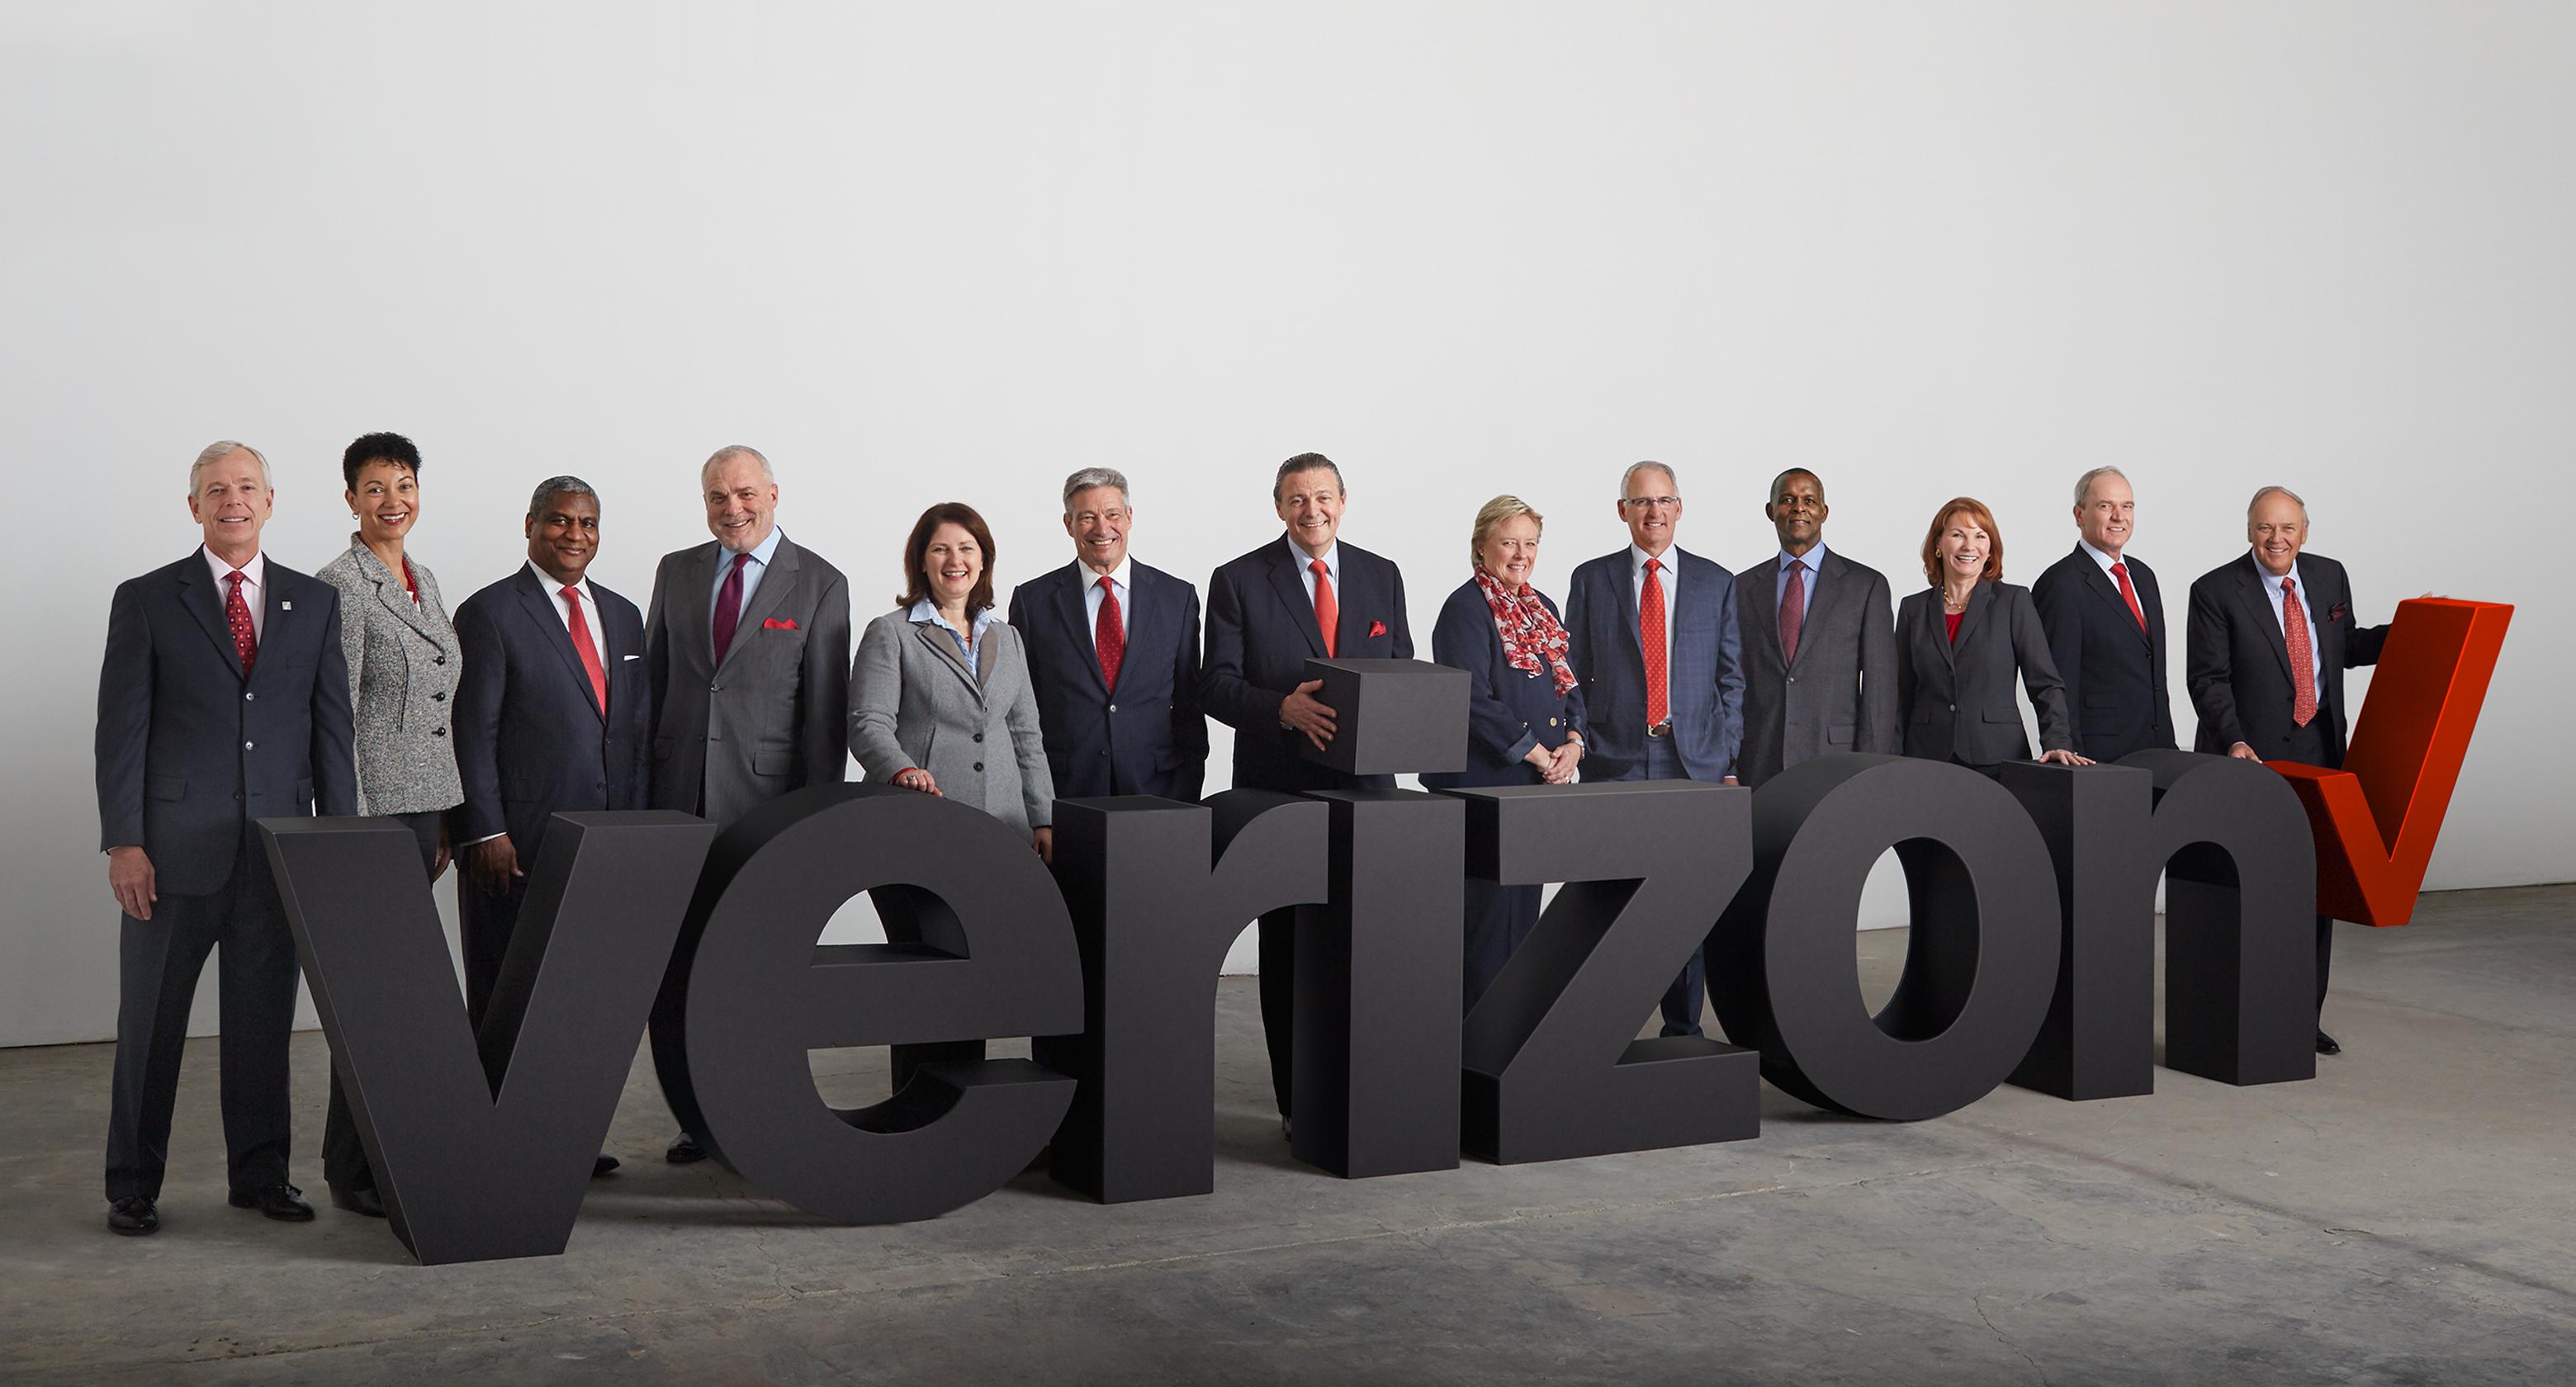 Verizon board of directors standing behind Verizon logo